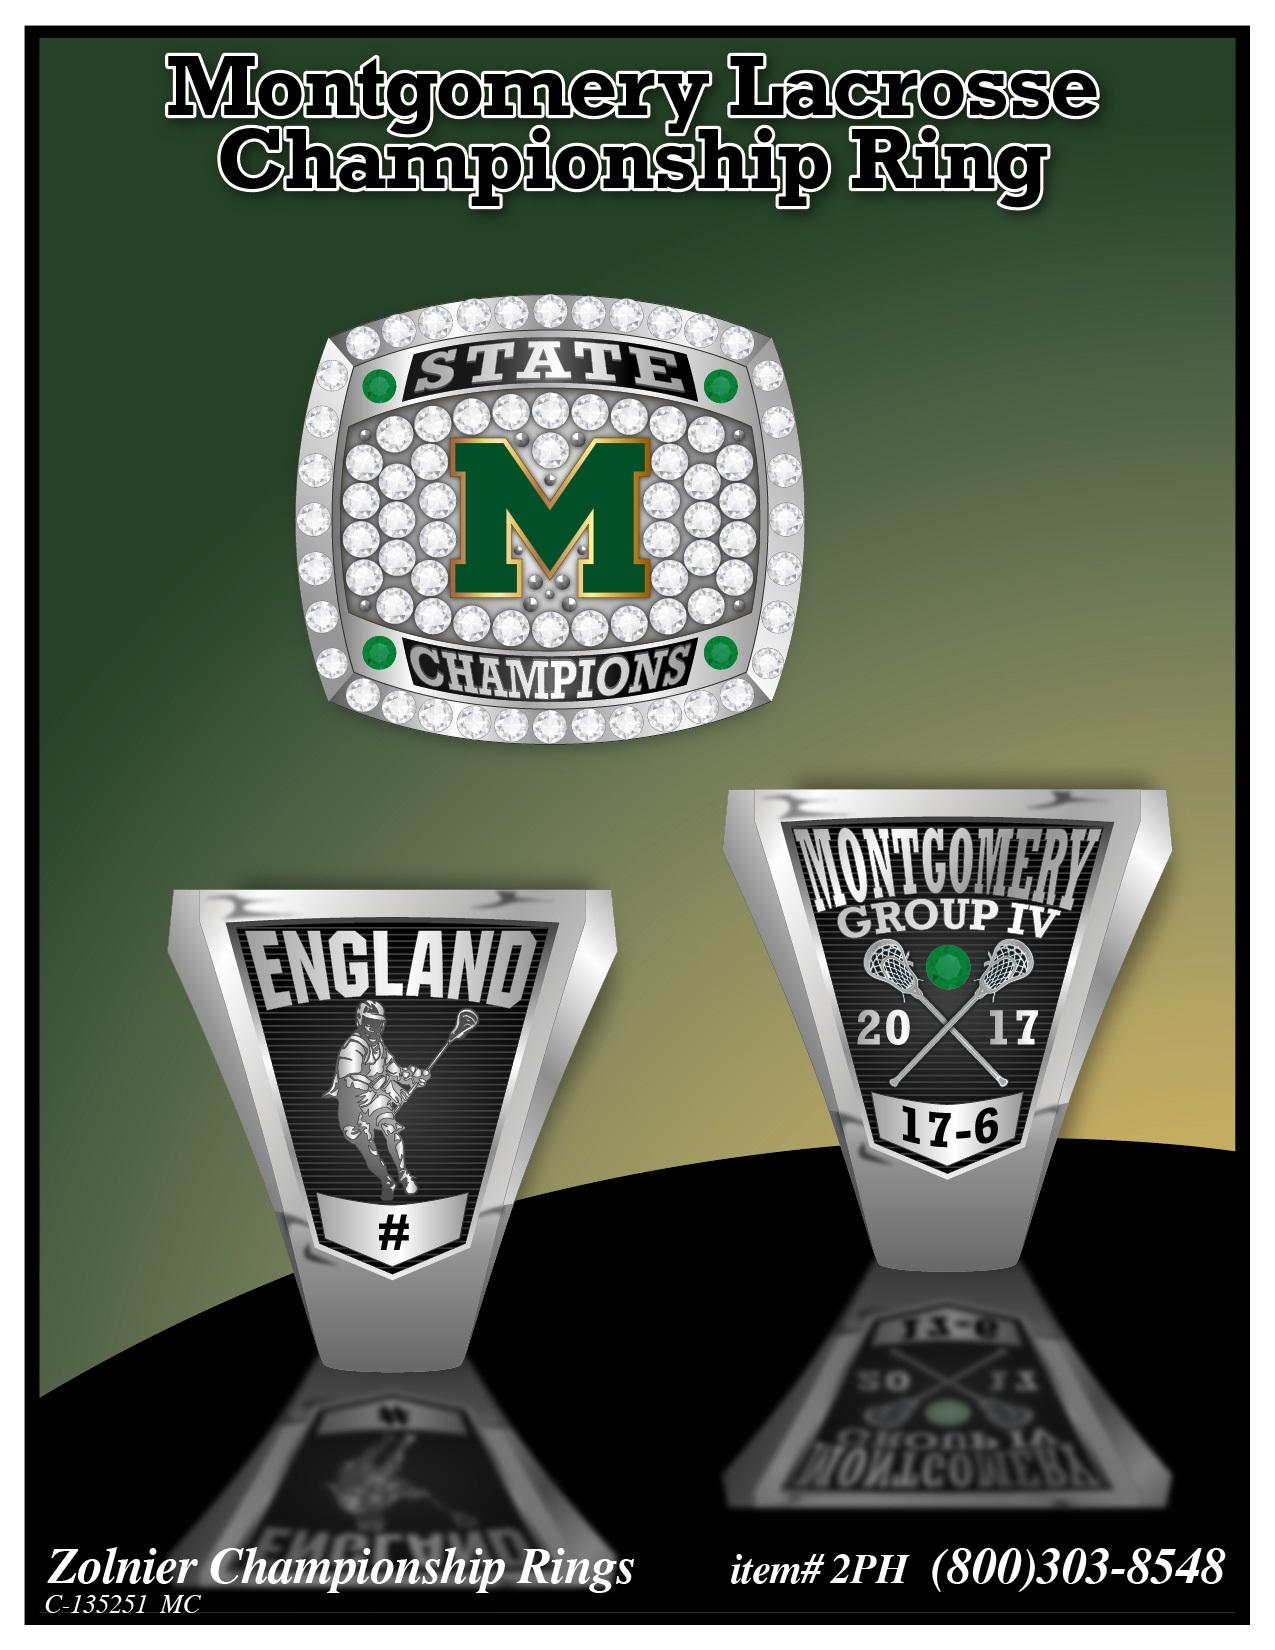 C-135251 Montgomery Lacrosse Champ Ring